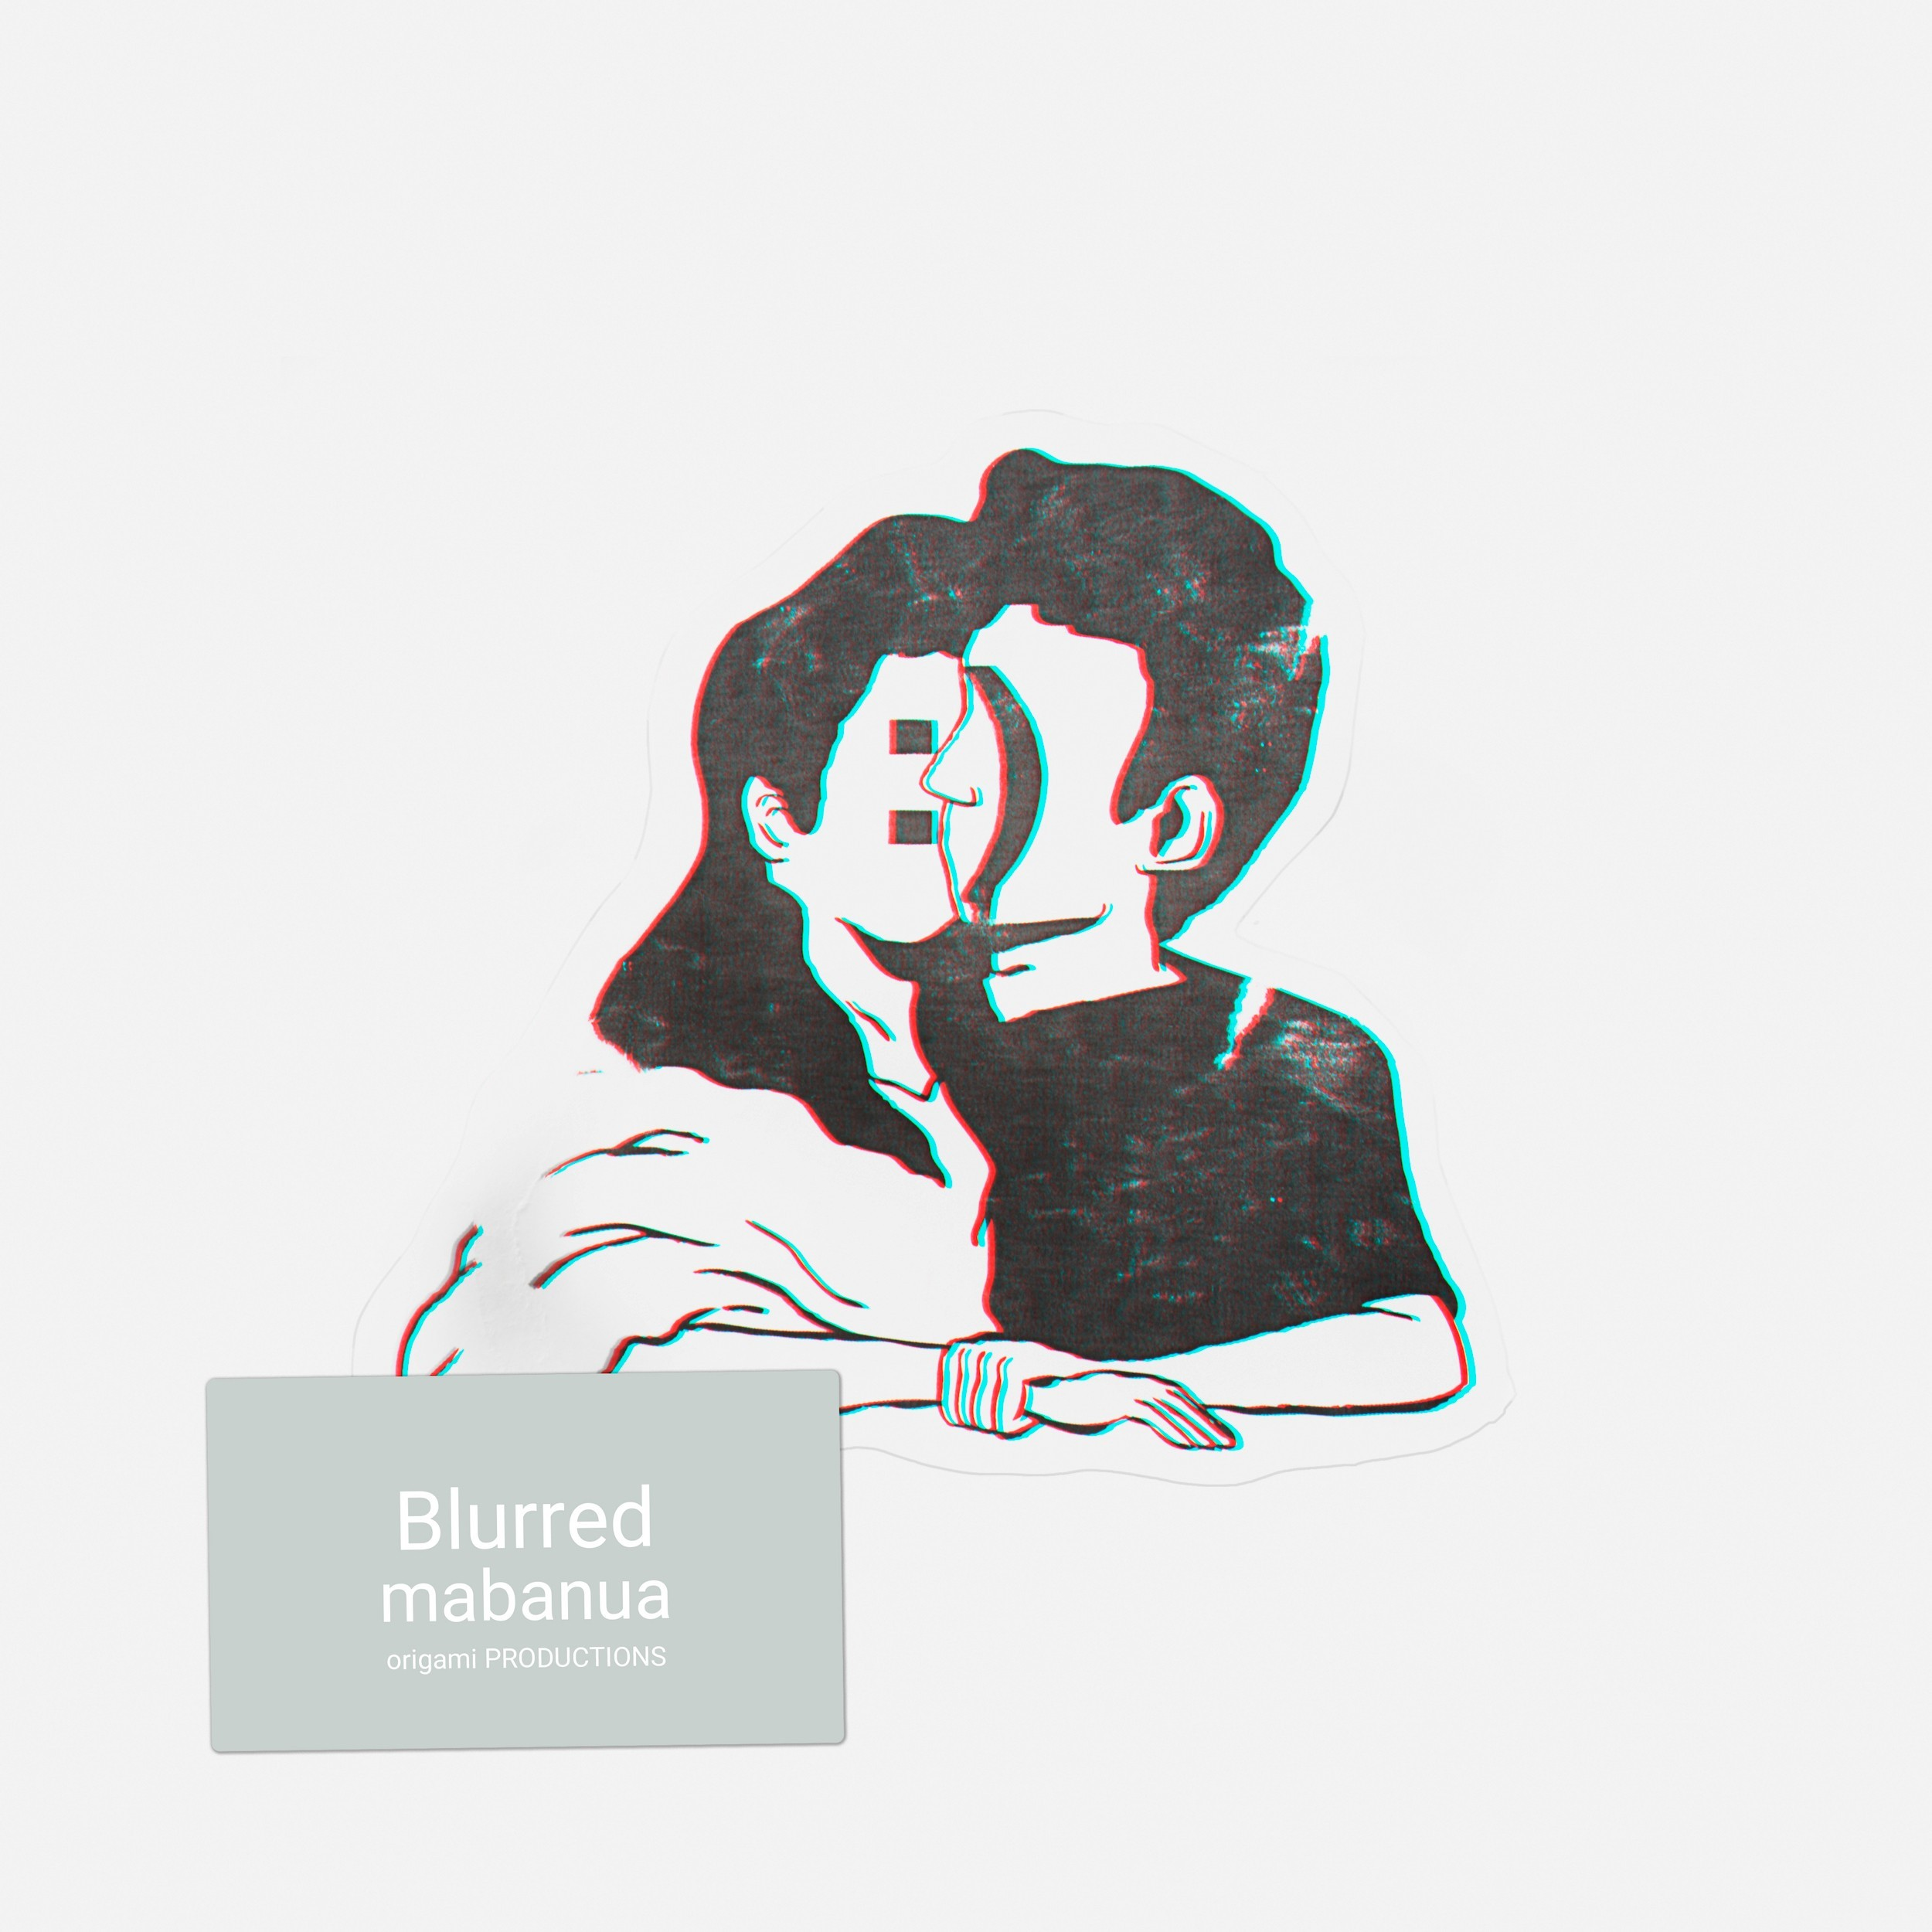 mabanua (バヌア) – Blurred [FLAC / WEB] [2018.08.29]